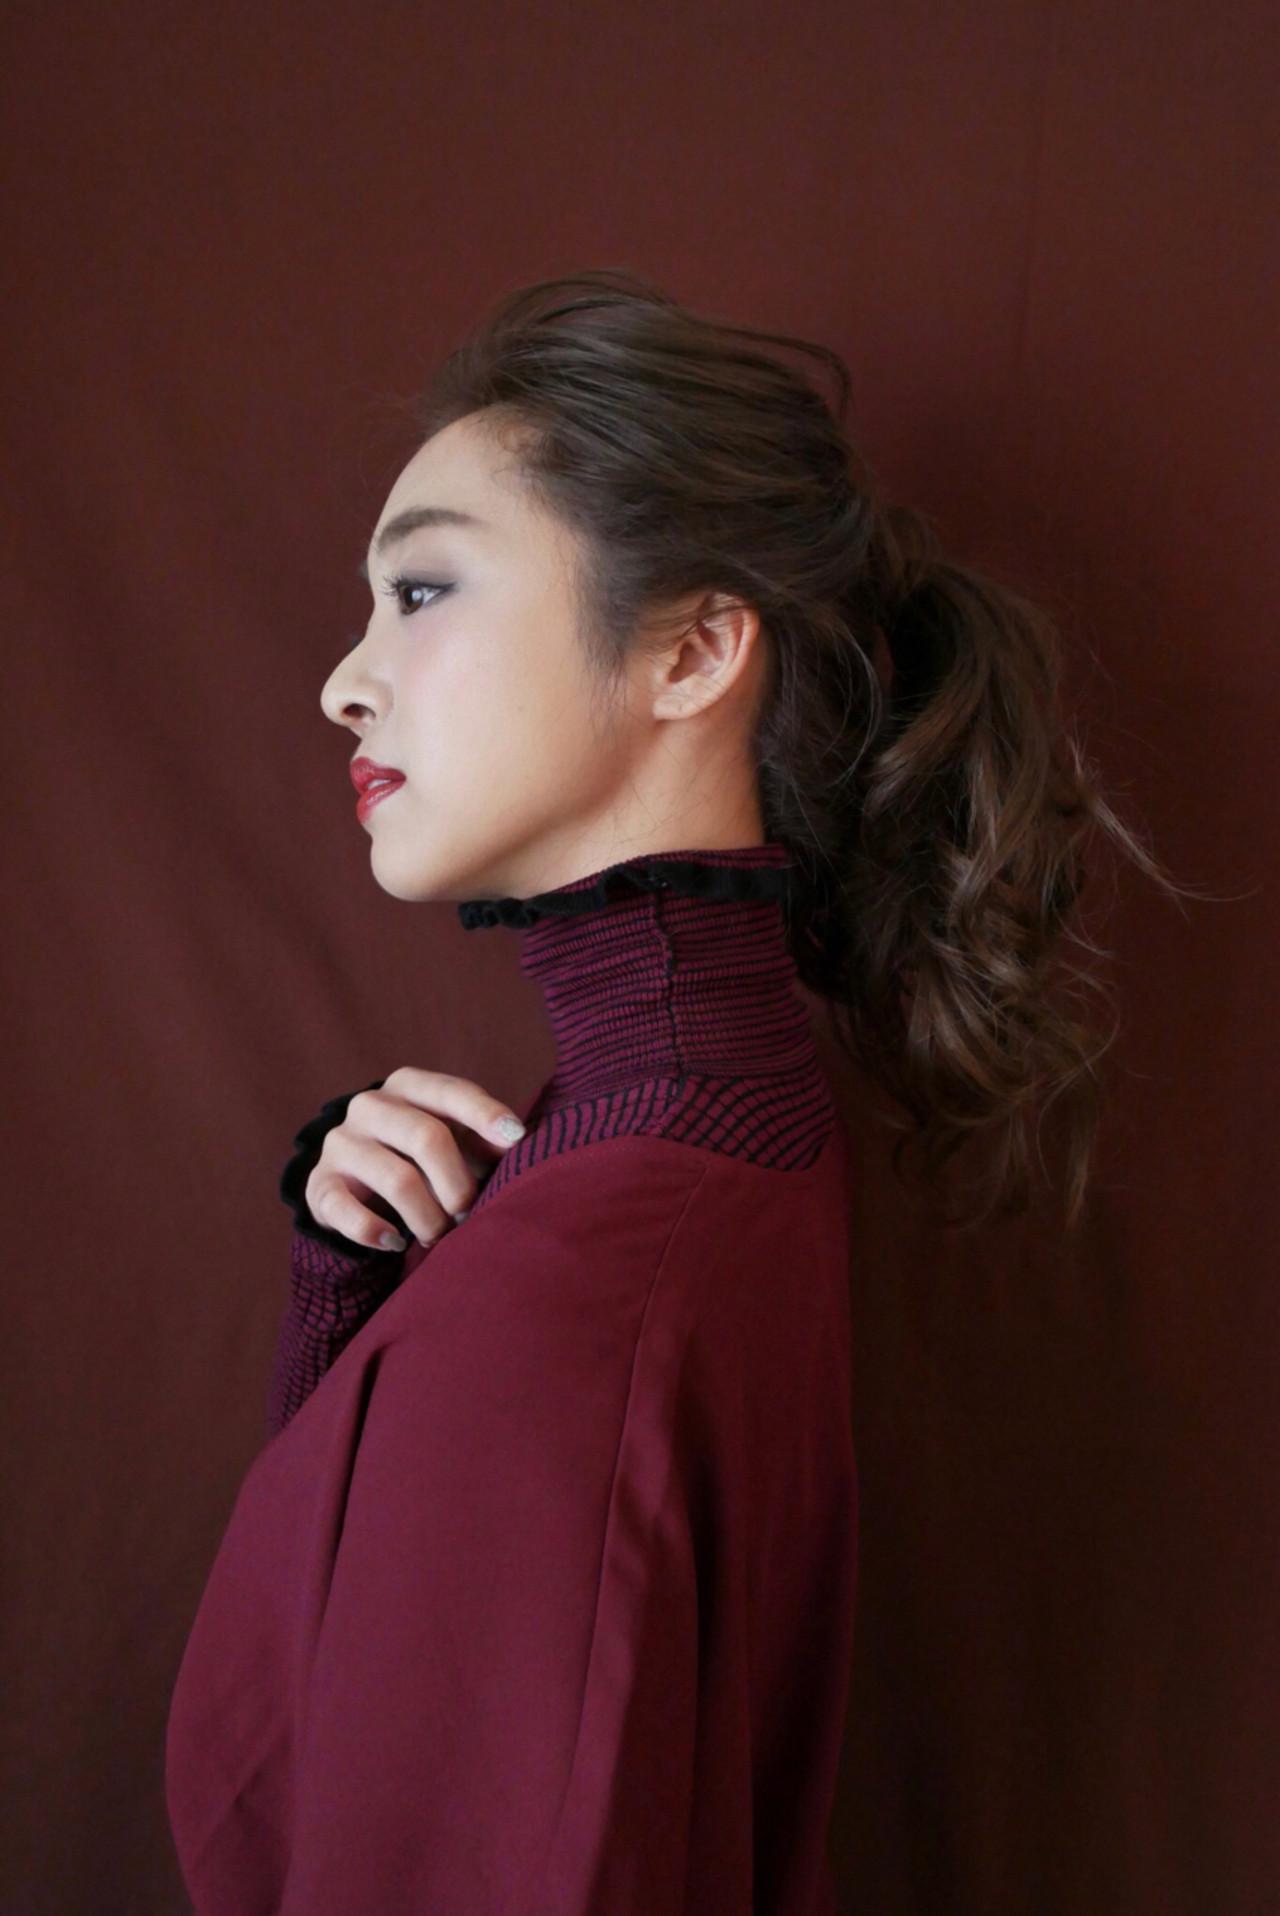 c59b3fae2051 伸ばしかけでも大丈夫♡前髪のタイプ別まとめ髪10選 (HAIR) - LINE ...